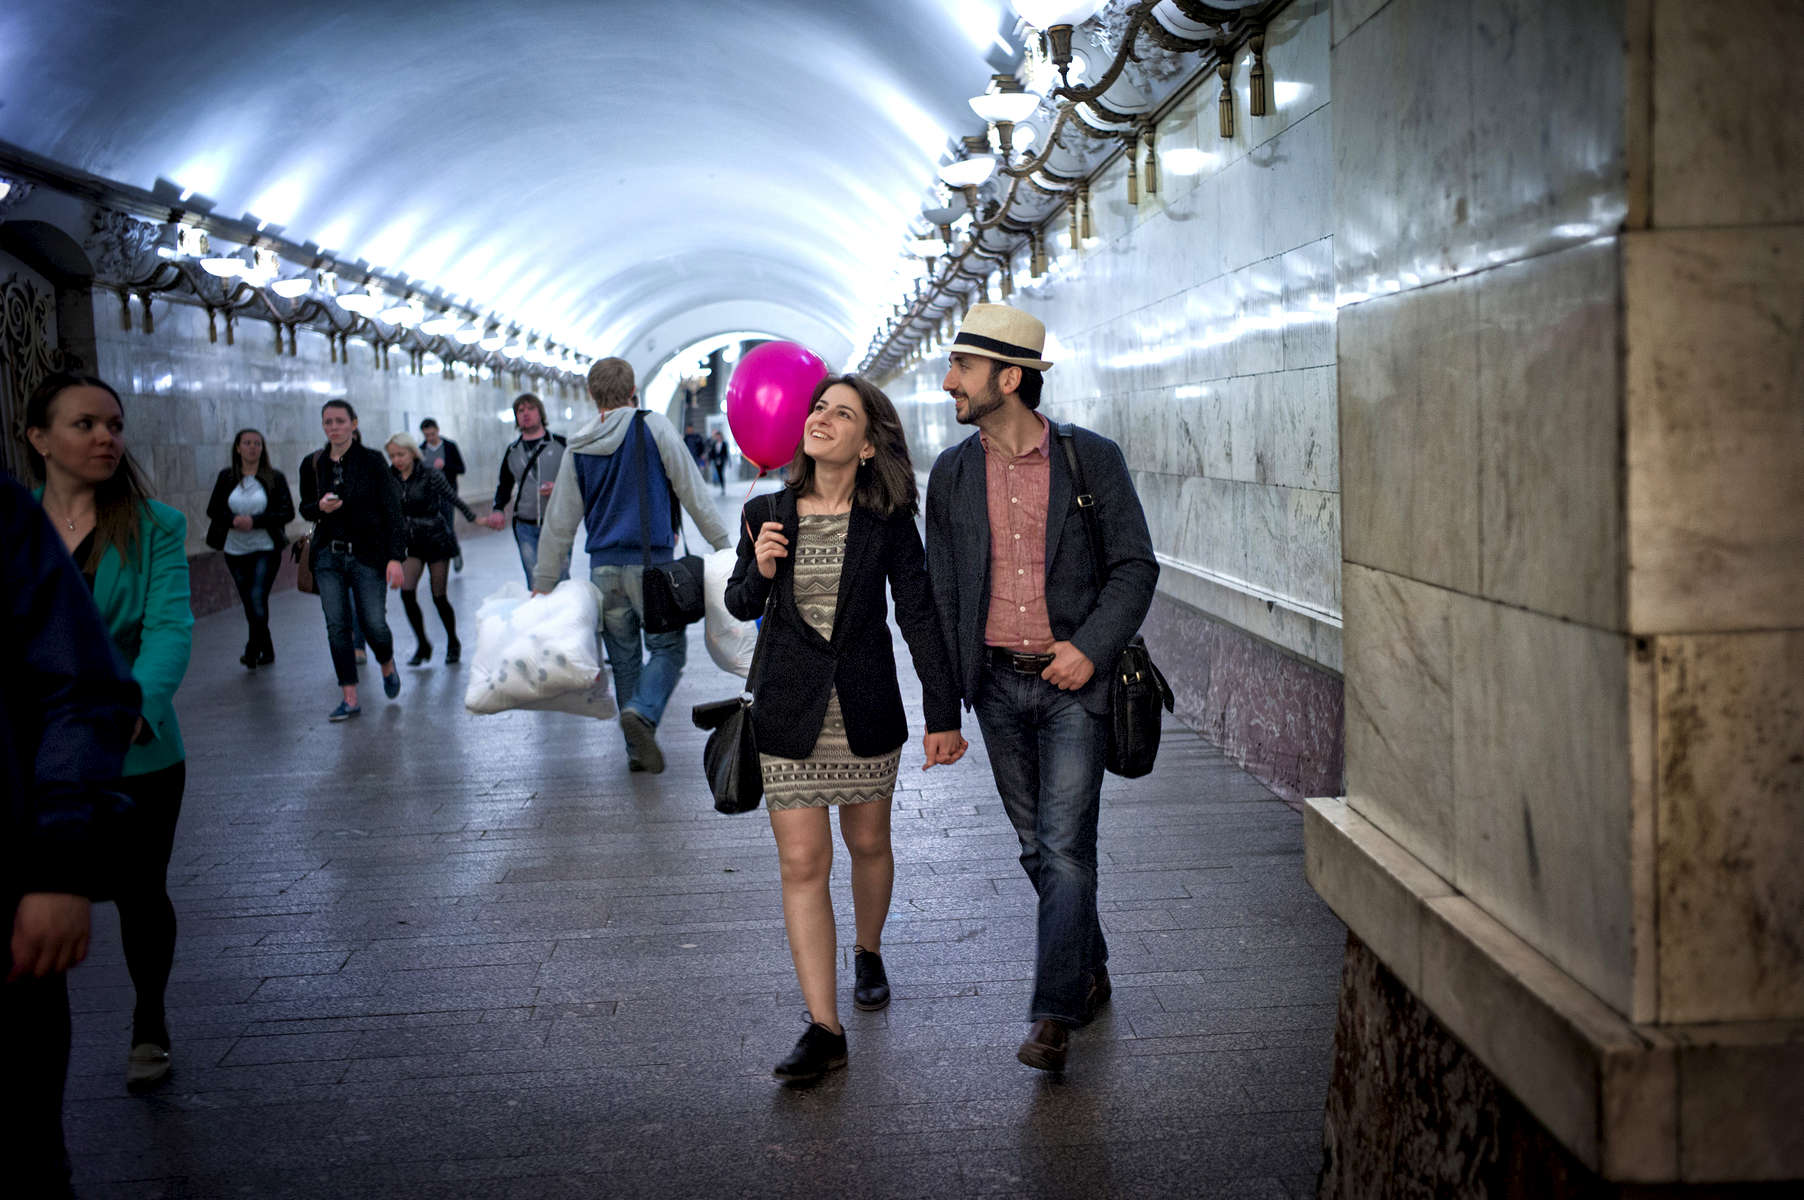 Arbatskata Metro Station - Moscow, Russia